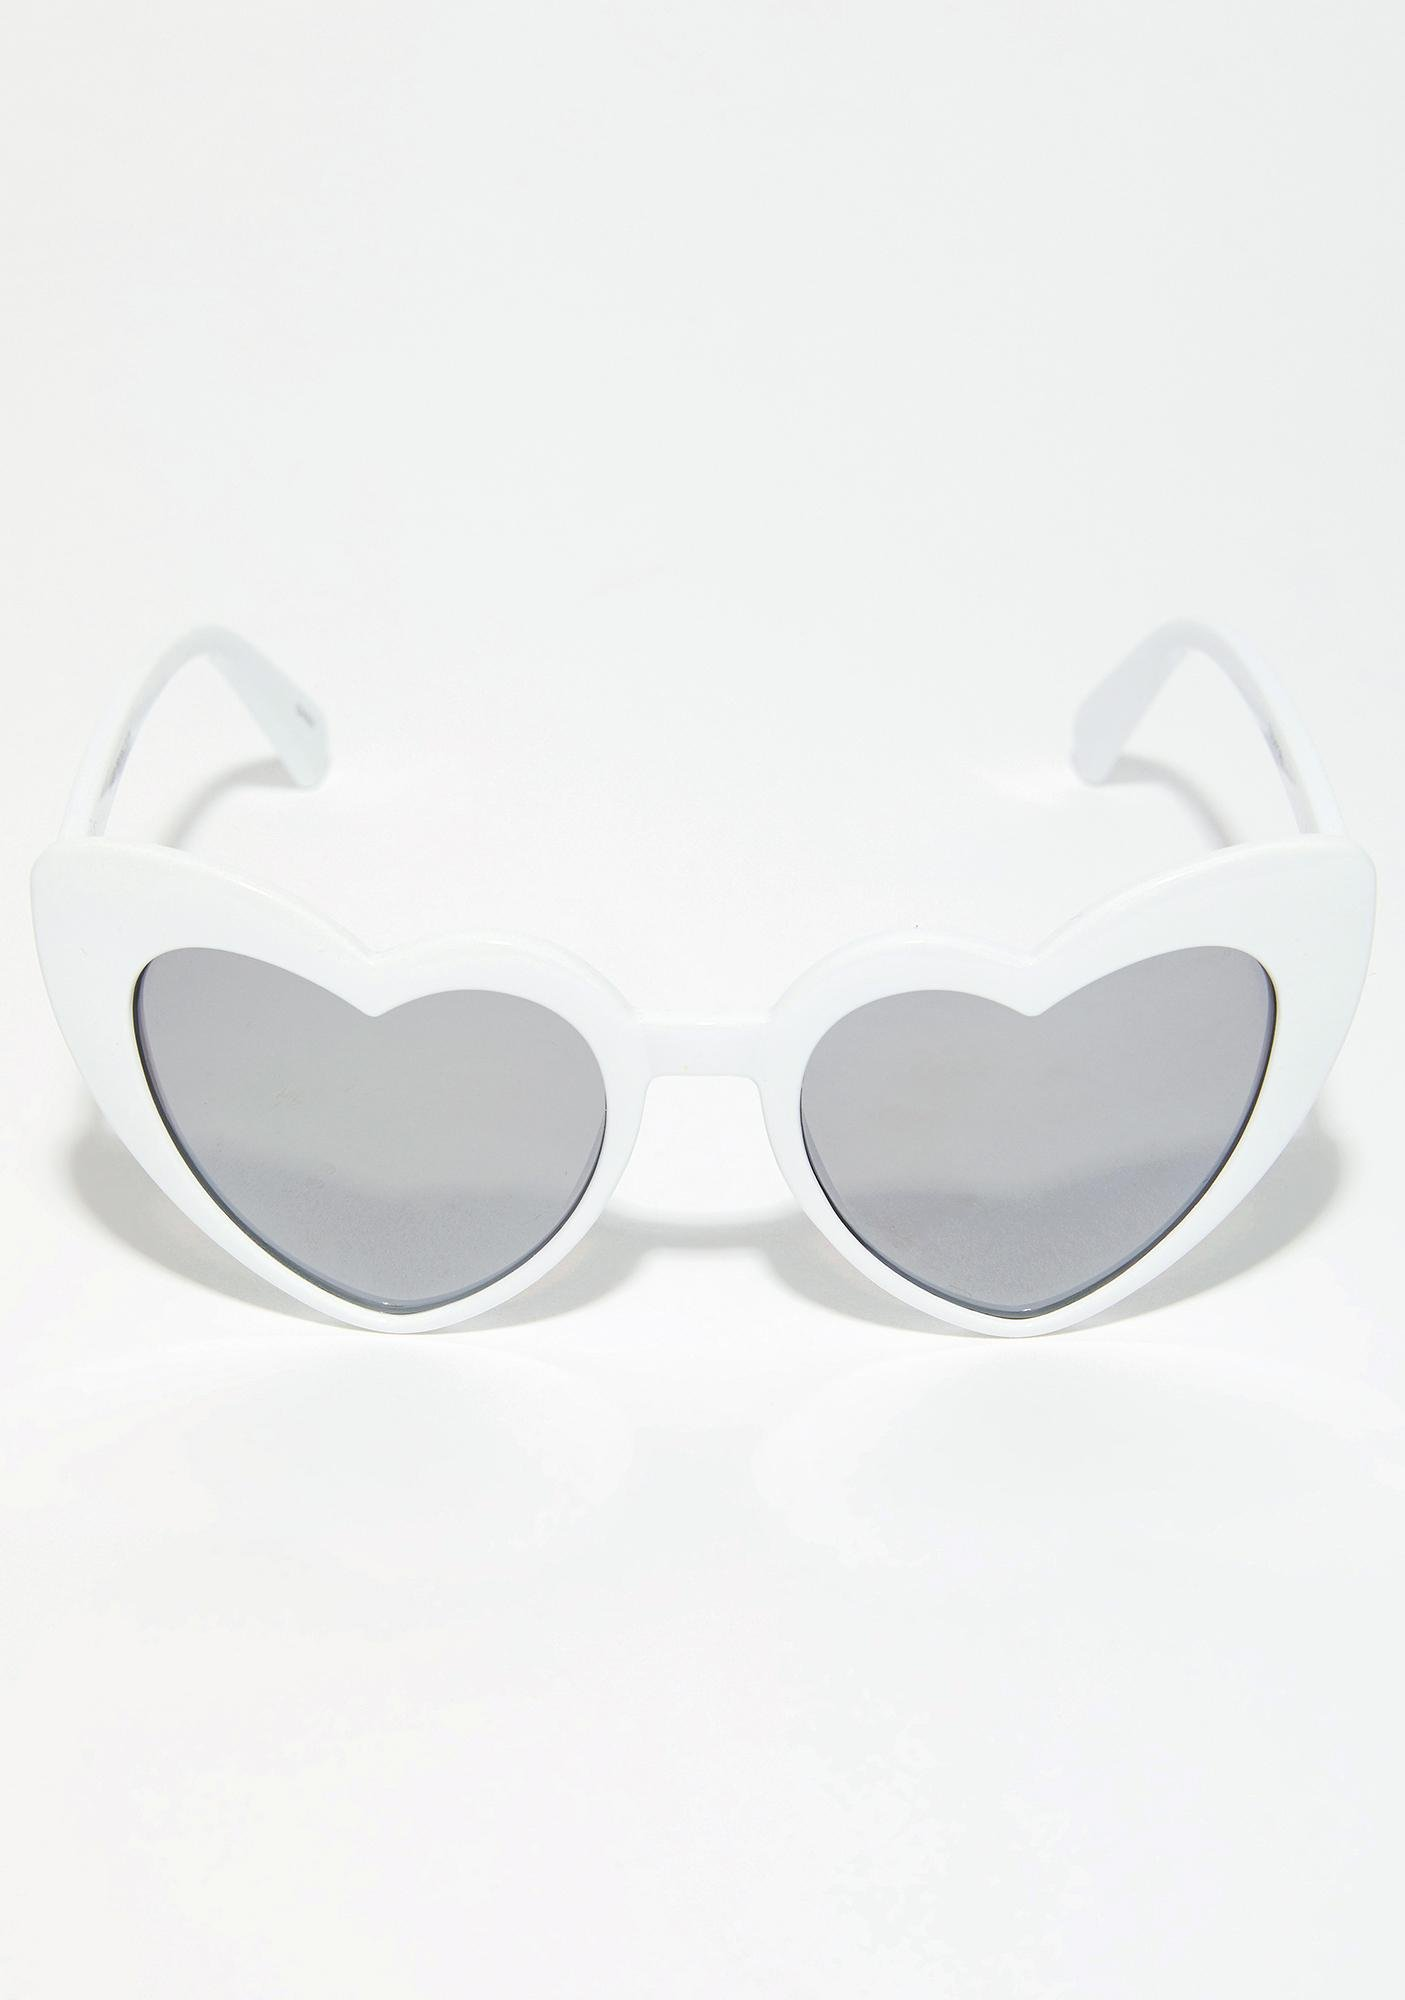 Glamourpuss Sunglasses